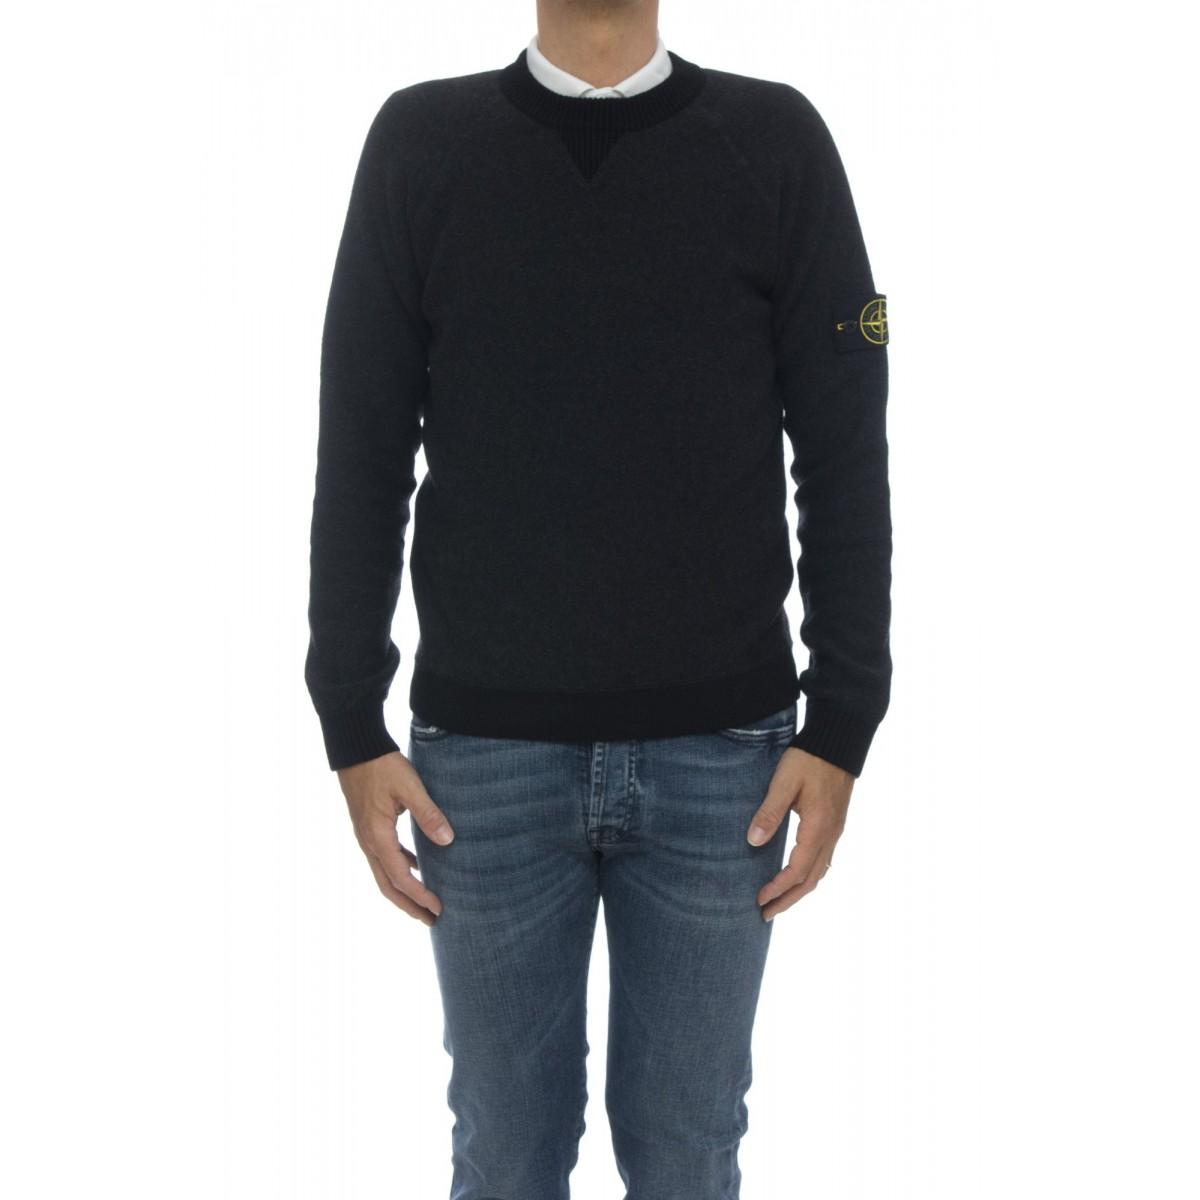 Maglia uomo - 529d9 girocllo lana cashmeire